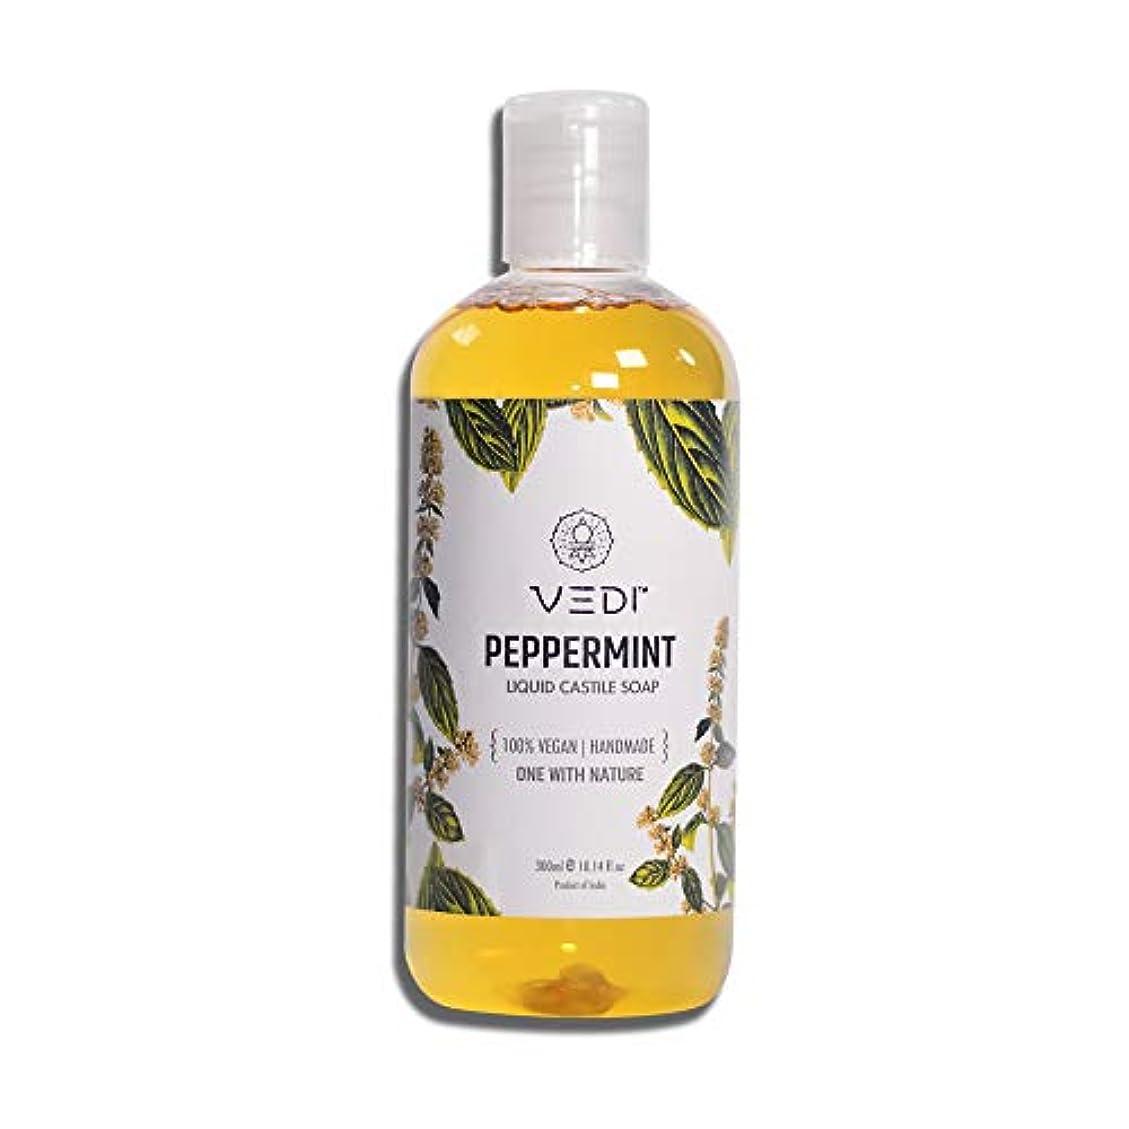 PEPPERMINT LIQUID CASTILE SOAP (300ml)